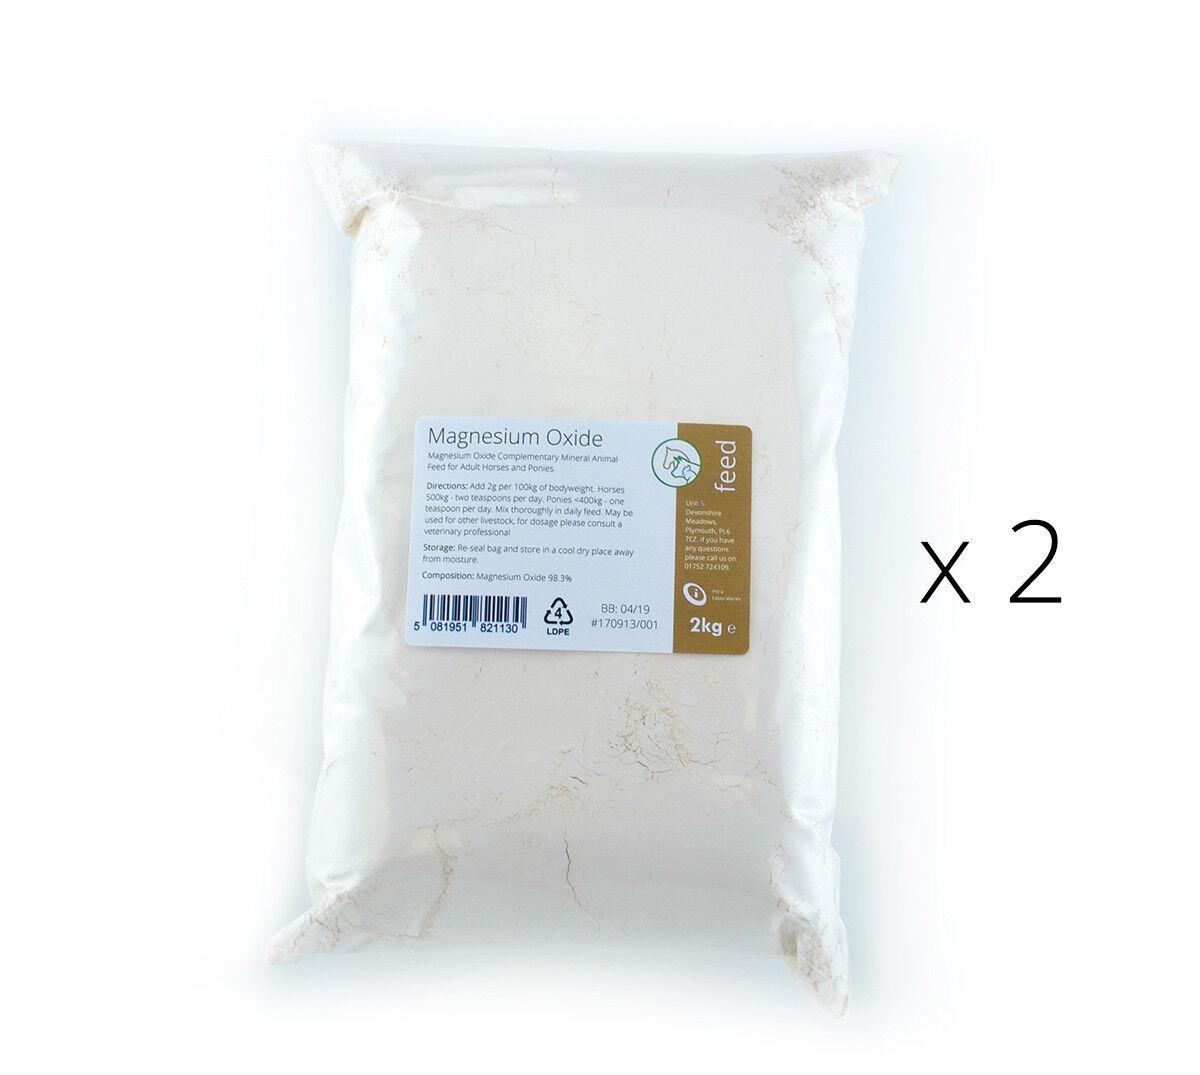 MAGNESIUM OXIDE 4kg - Mag Ox Calmer - Horse Equine Supplement - 98.3% Pure